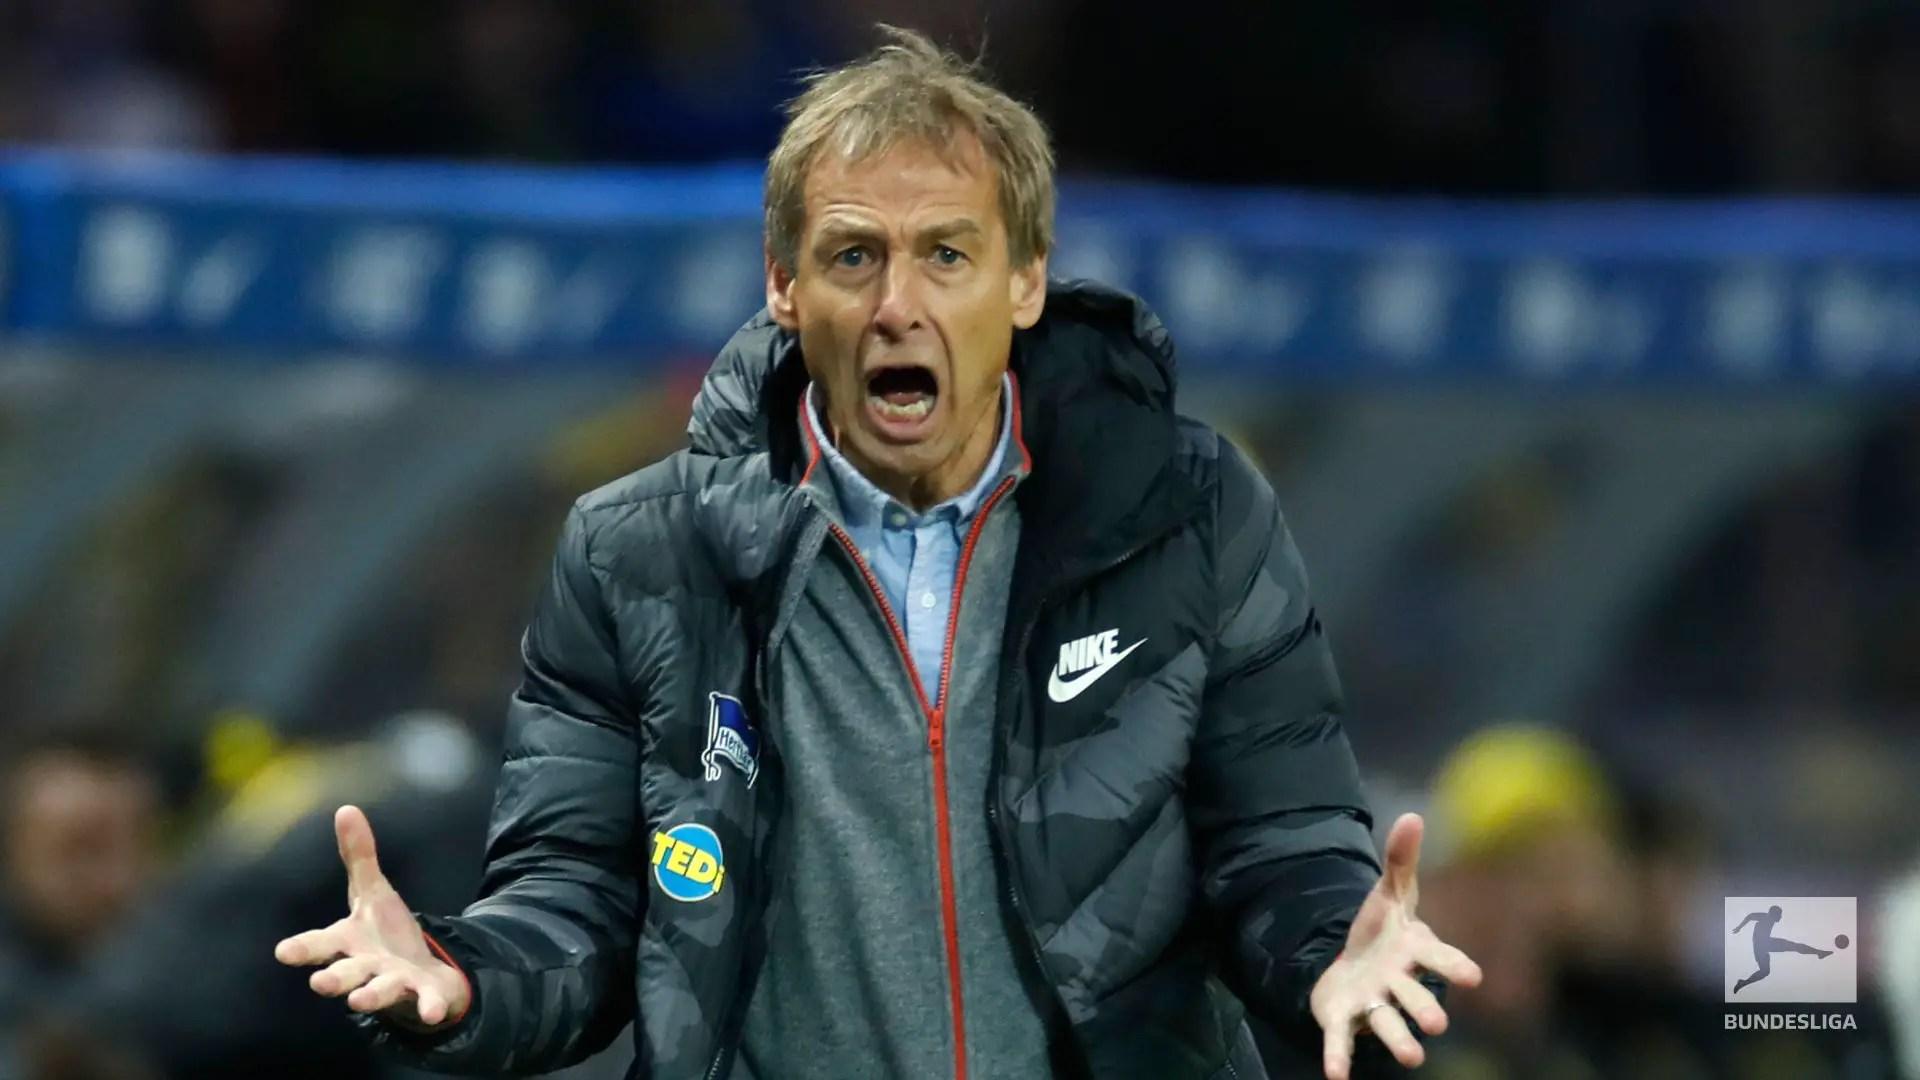 Klinsmann: It Feels Wonderful Being Back in Wonderful Bundesliga